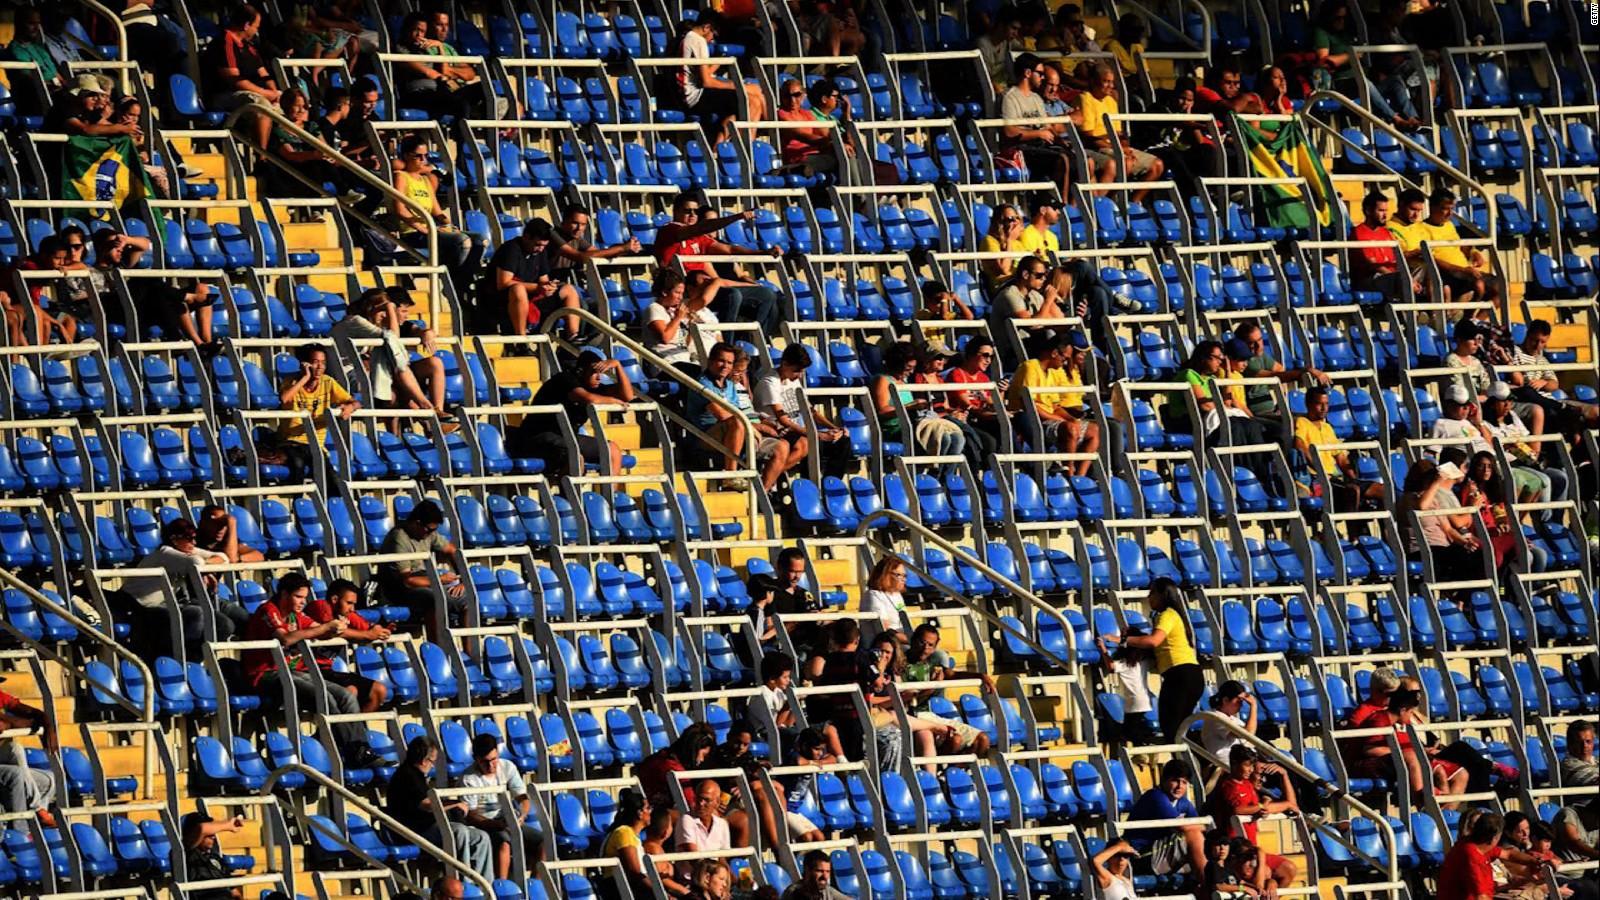 Olympics 2016 Why All The Empty Seats Cnn